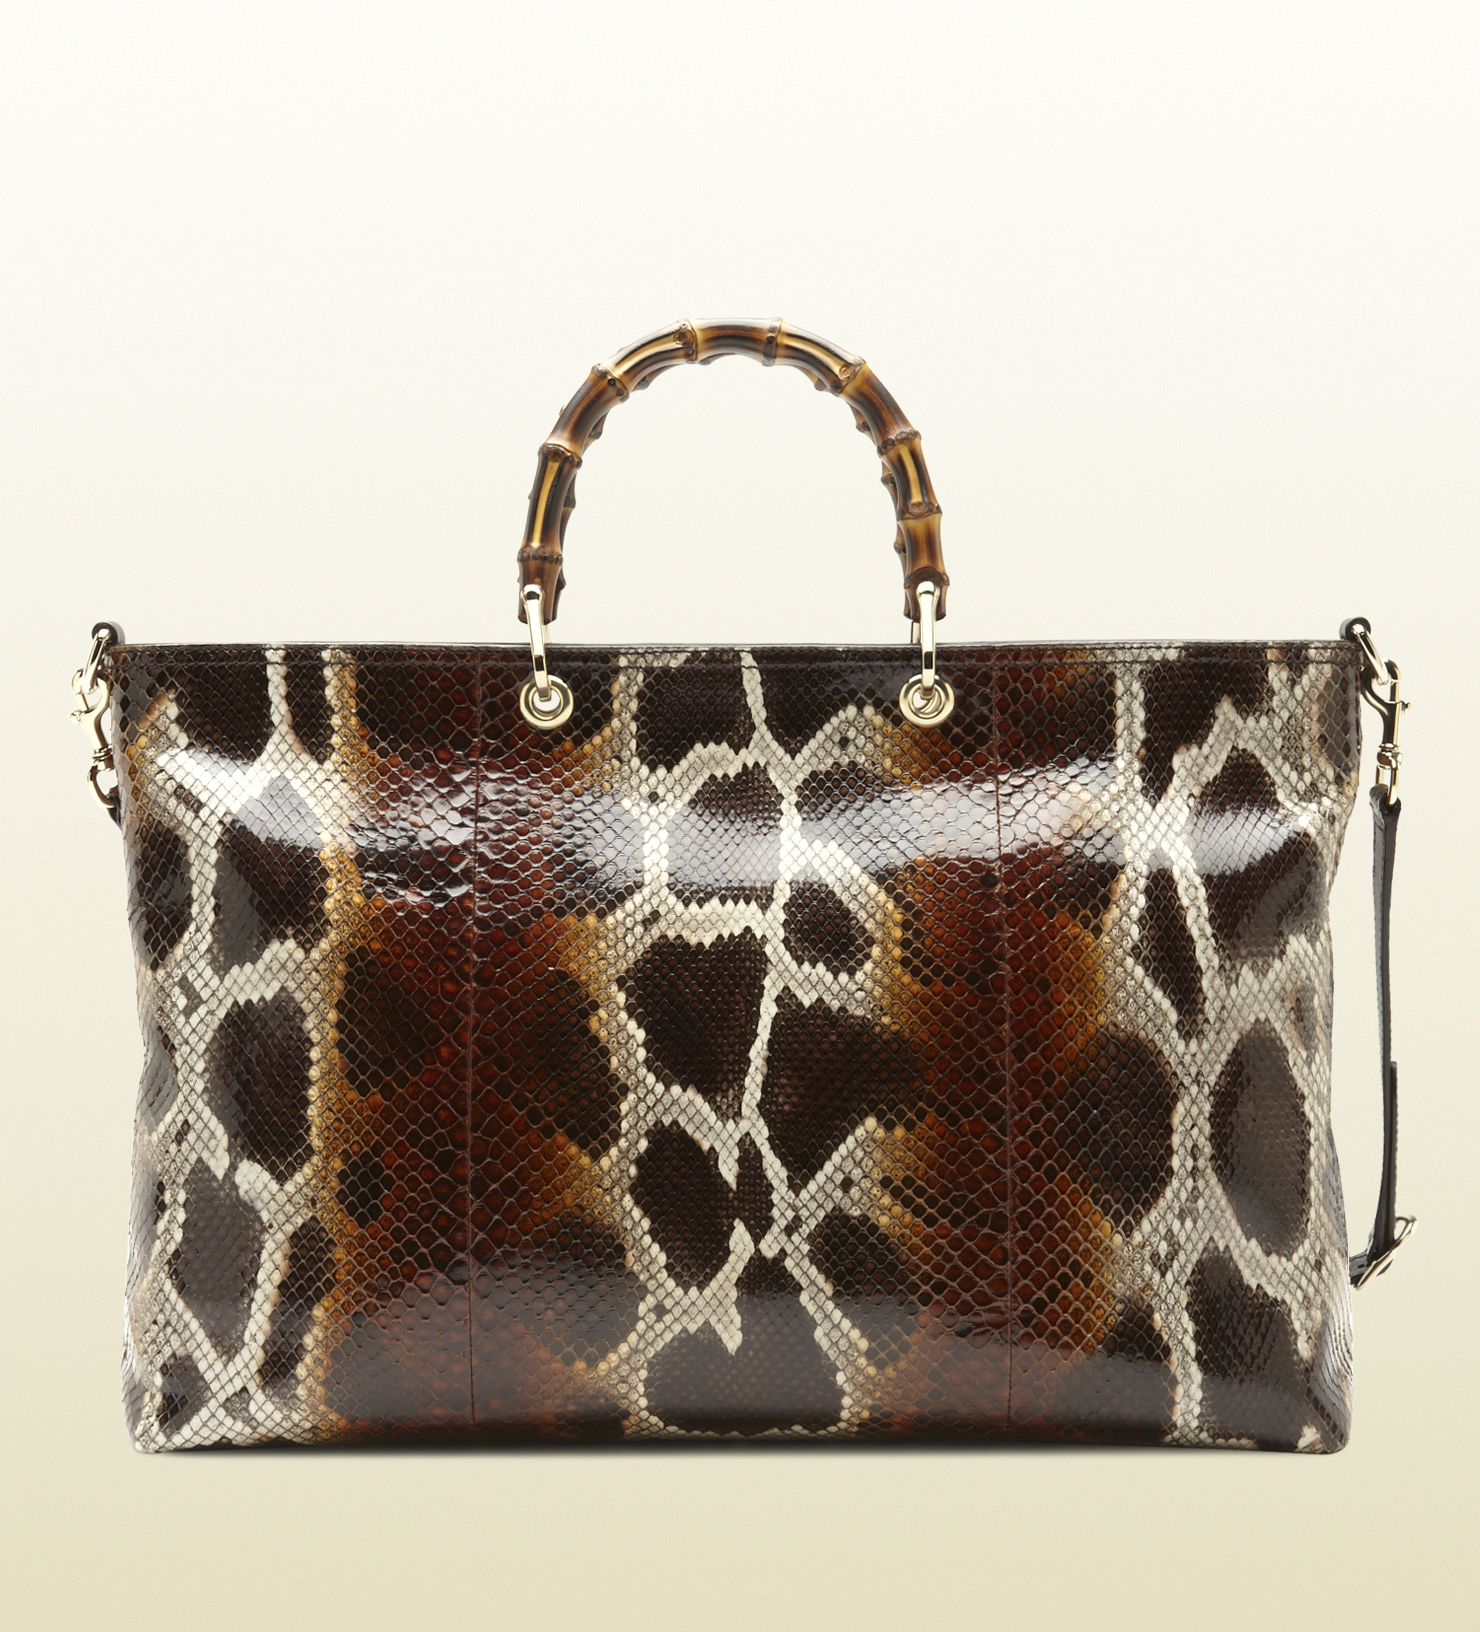 889b3de6460923 Gucci Bamboo Shopper Python Tote - Lyst